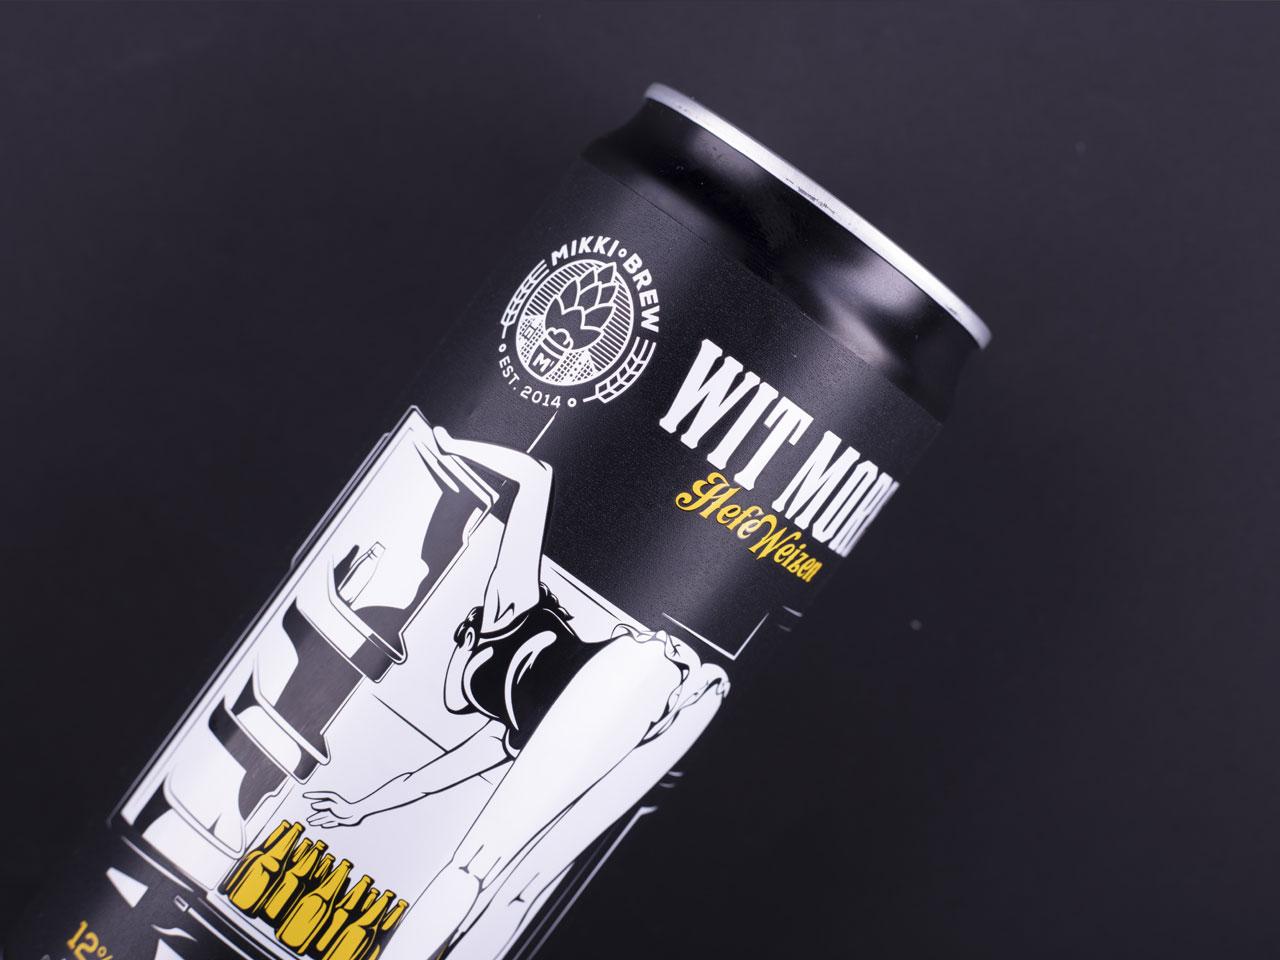 етикетка для пива тренд